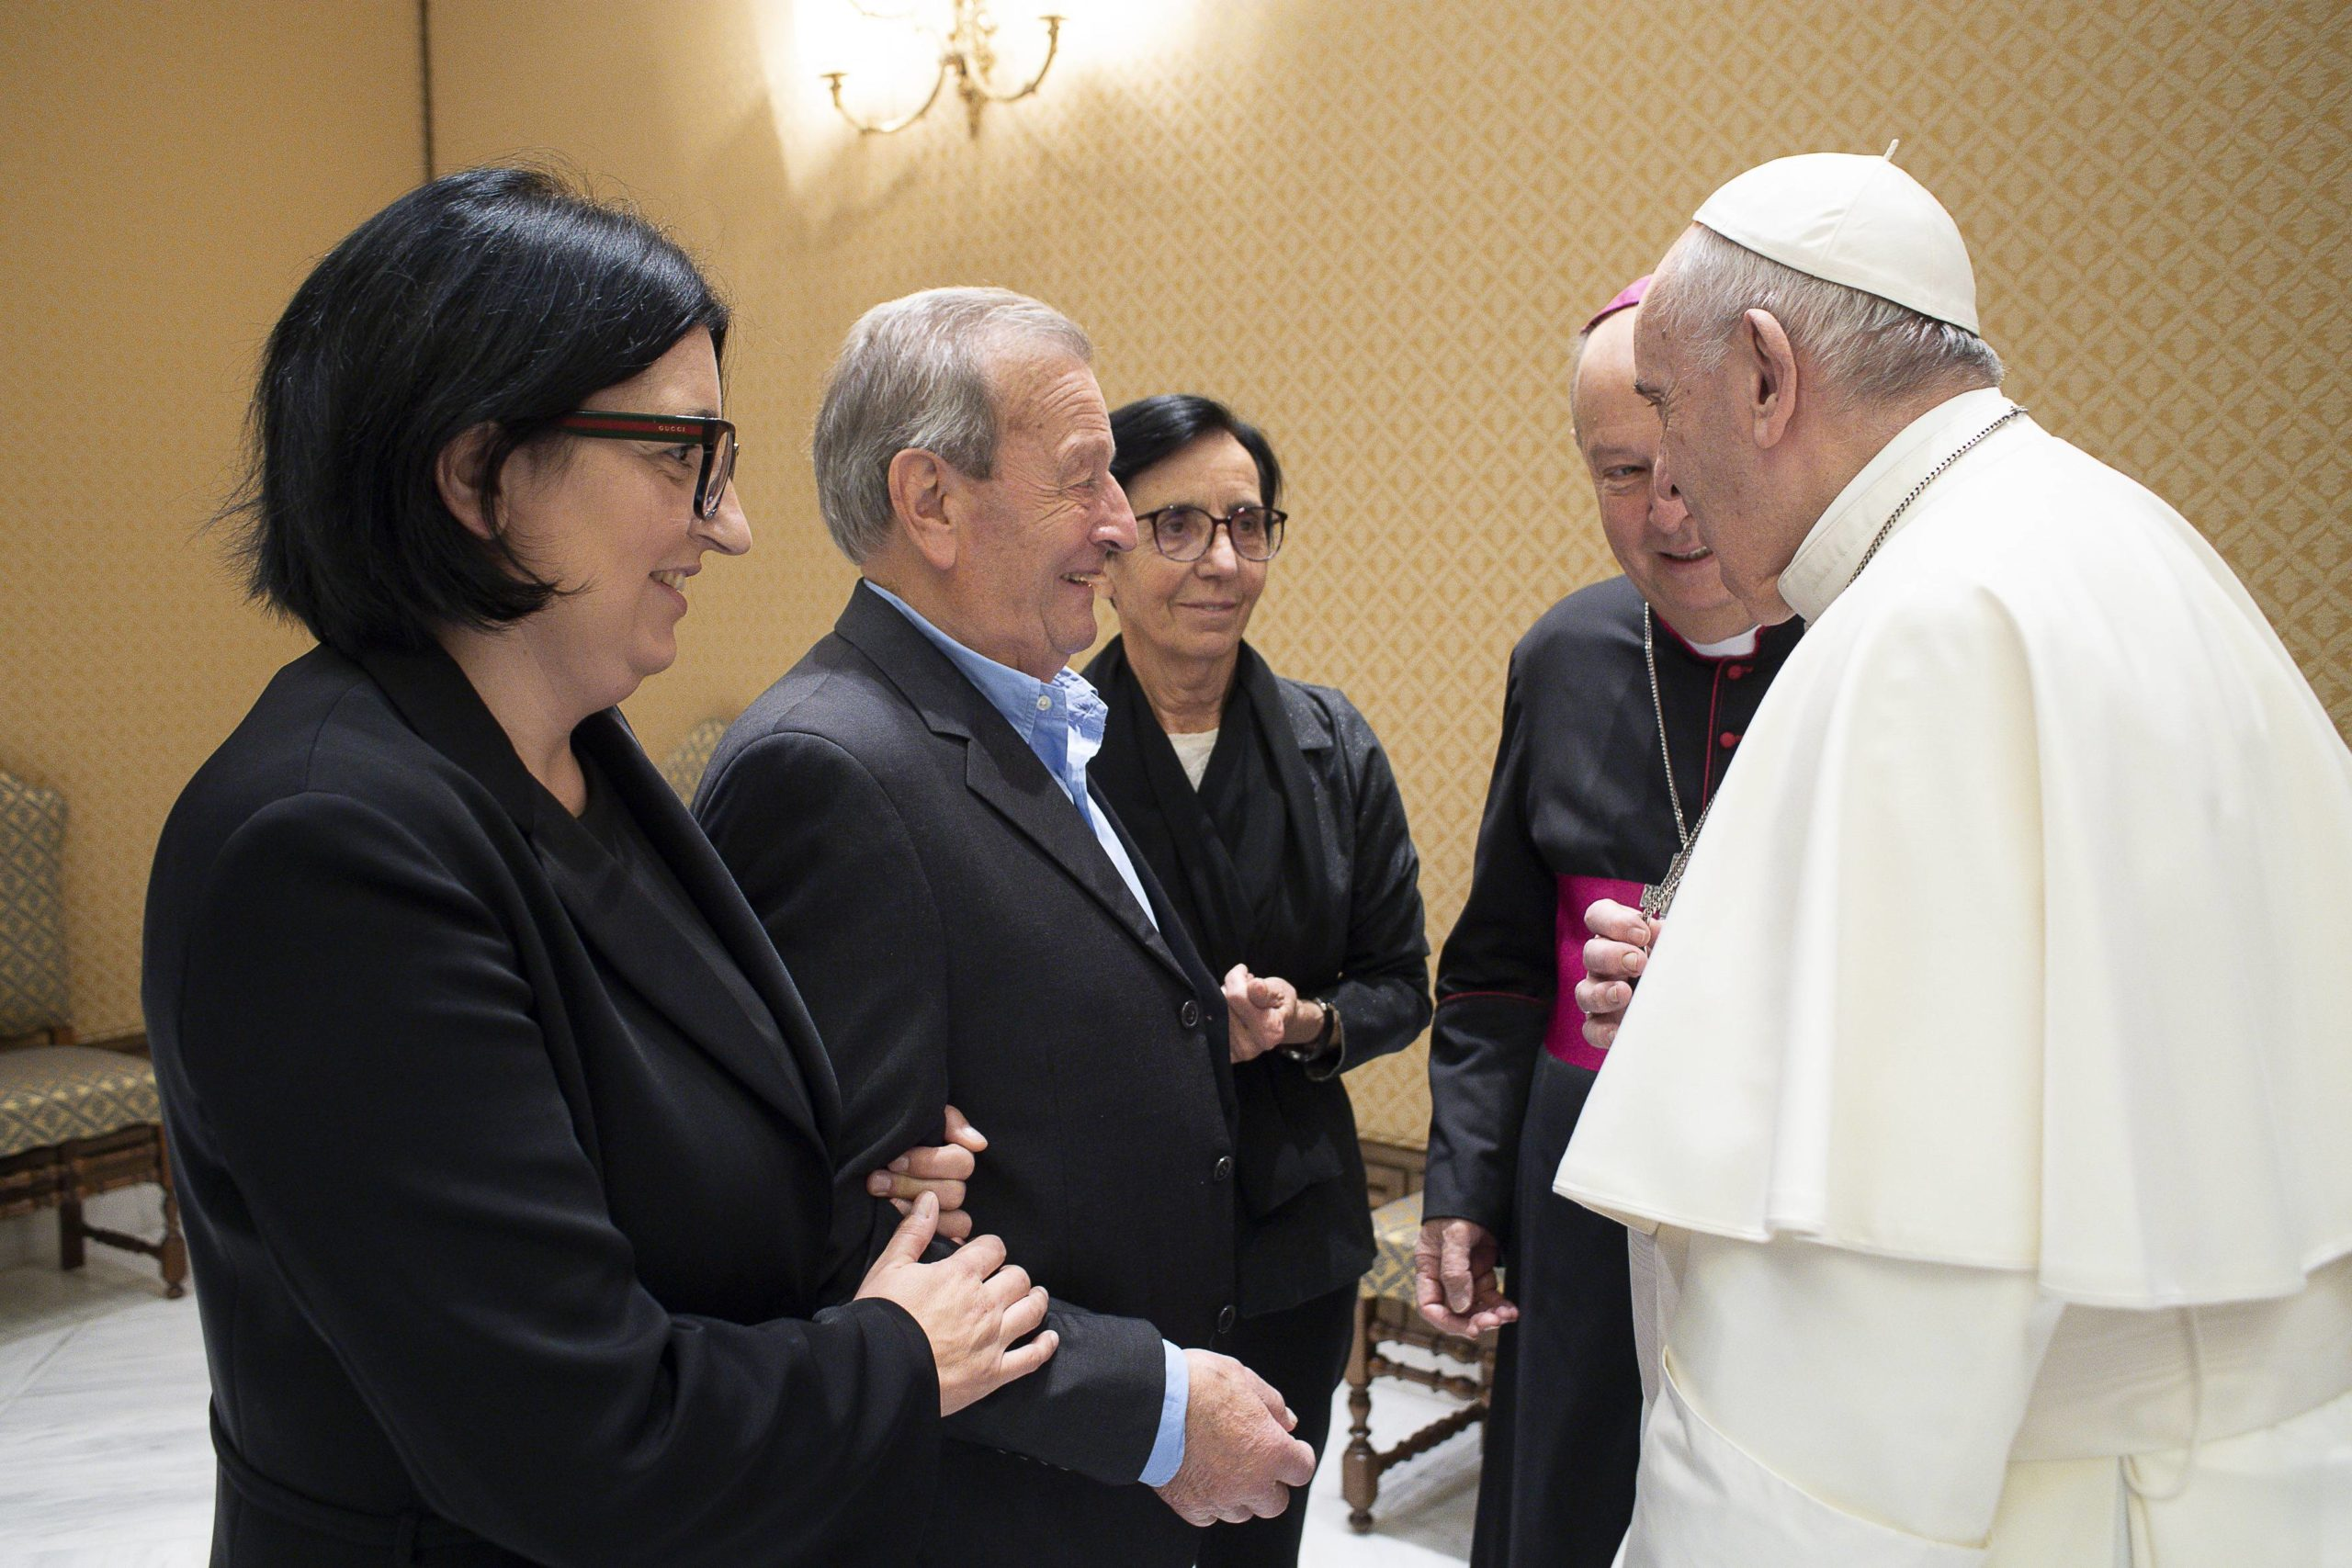 Famille du p. Roberto Malgesini, tué à Côme © Vatican Media